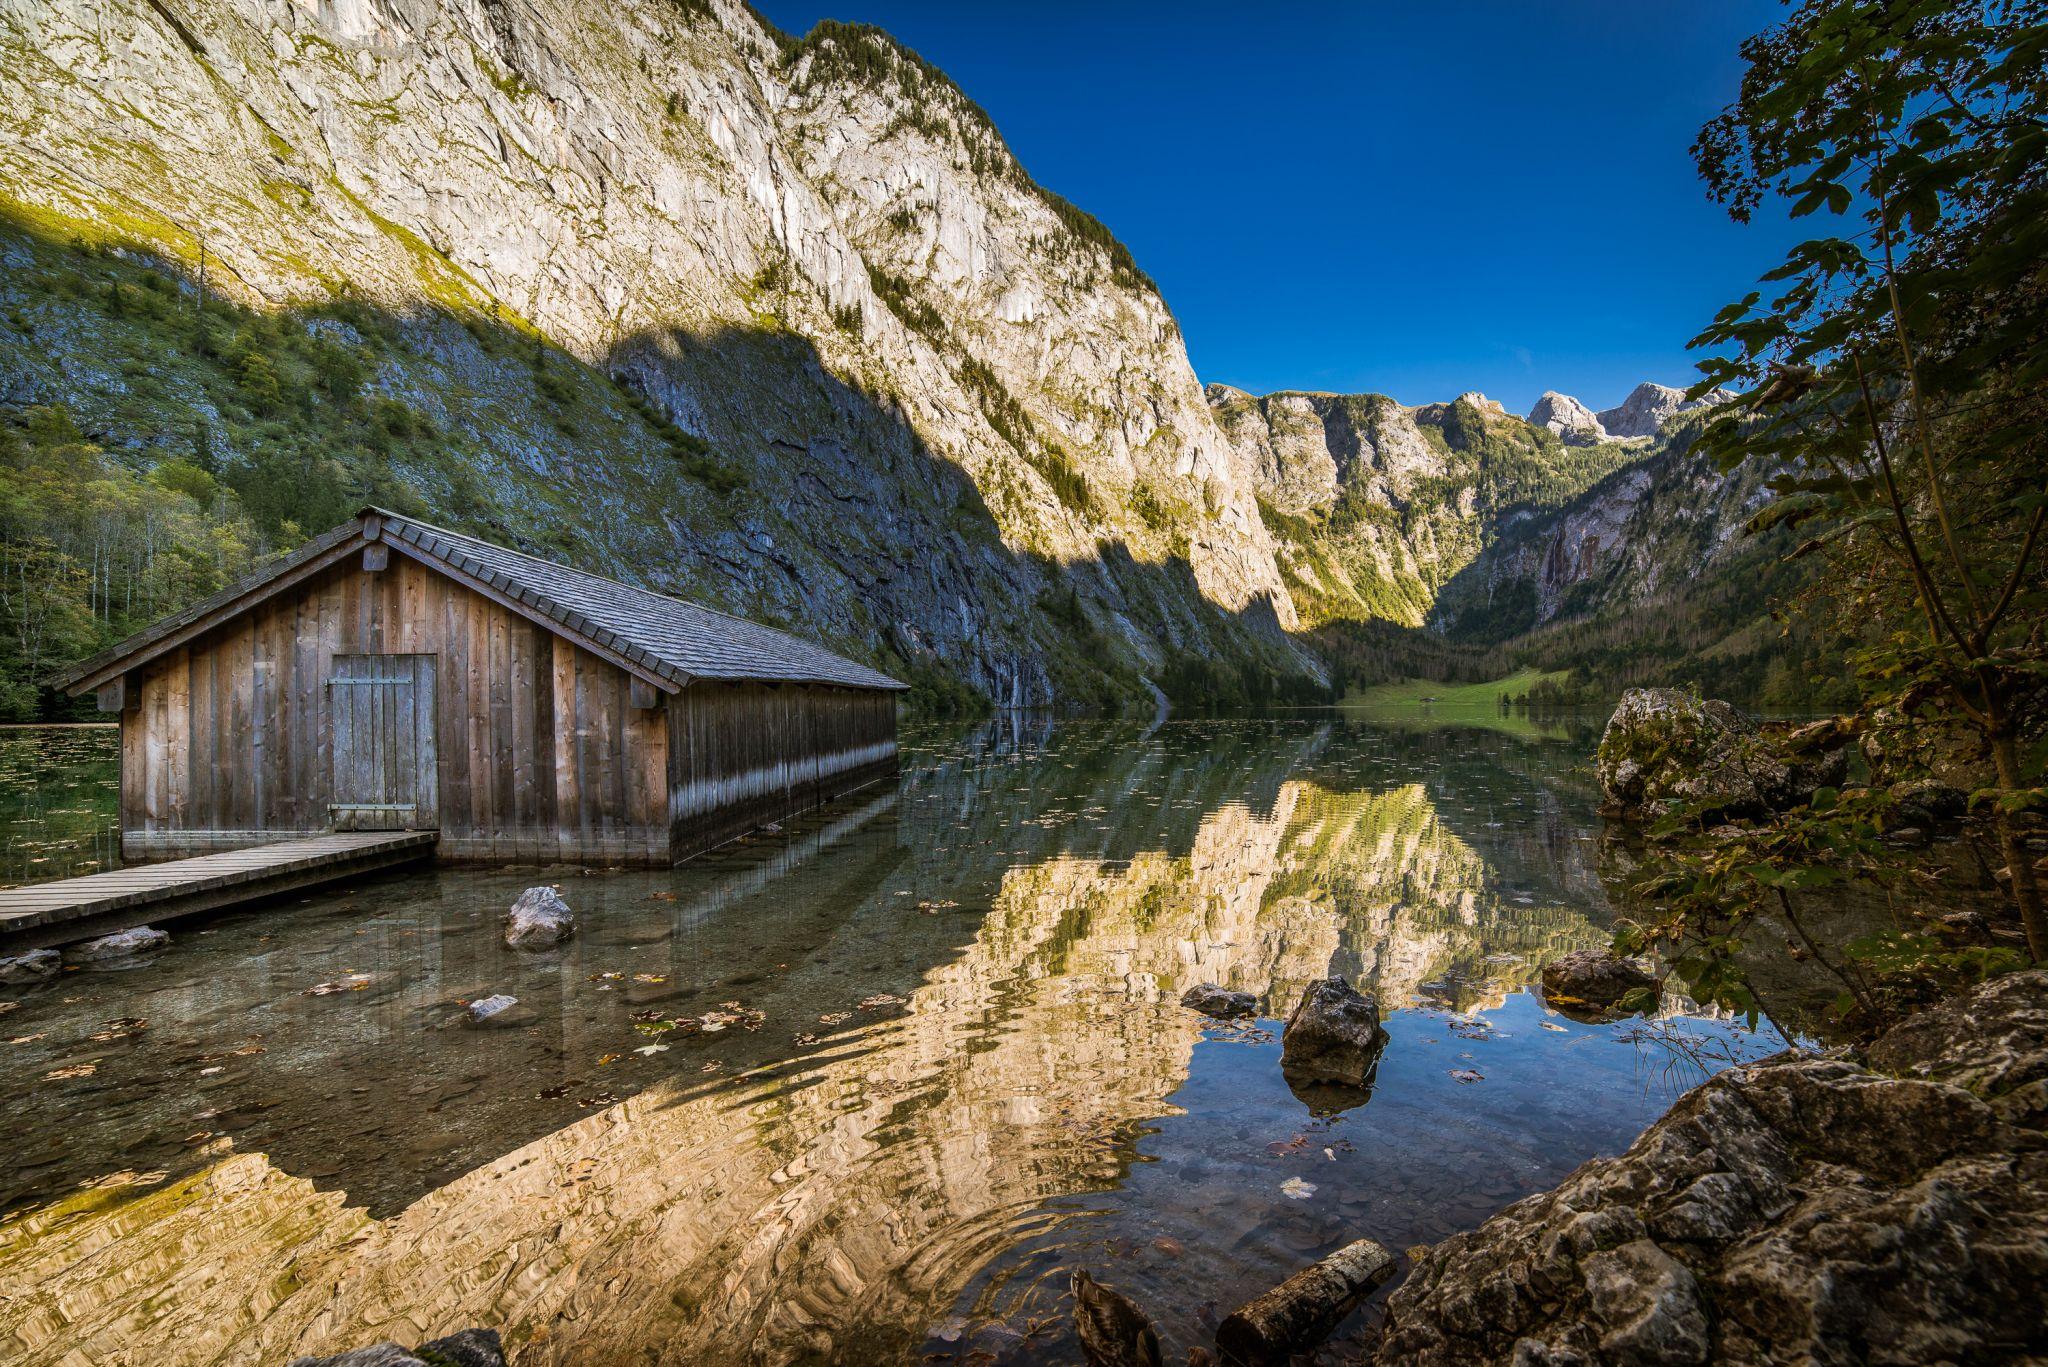 Nationalpark Berchtesgaden, Germany